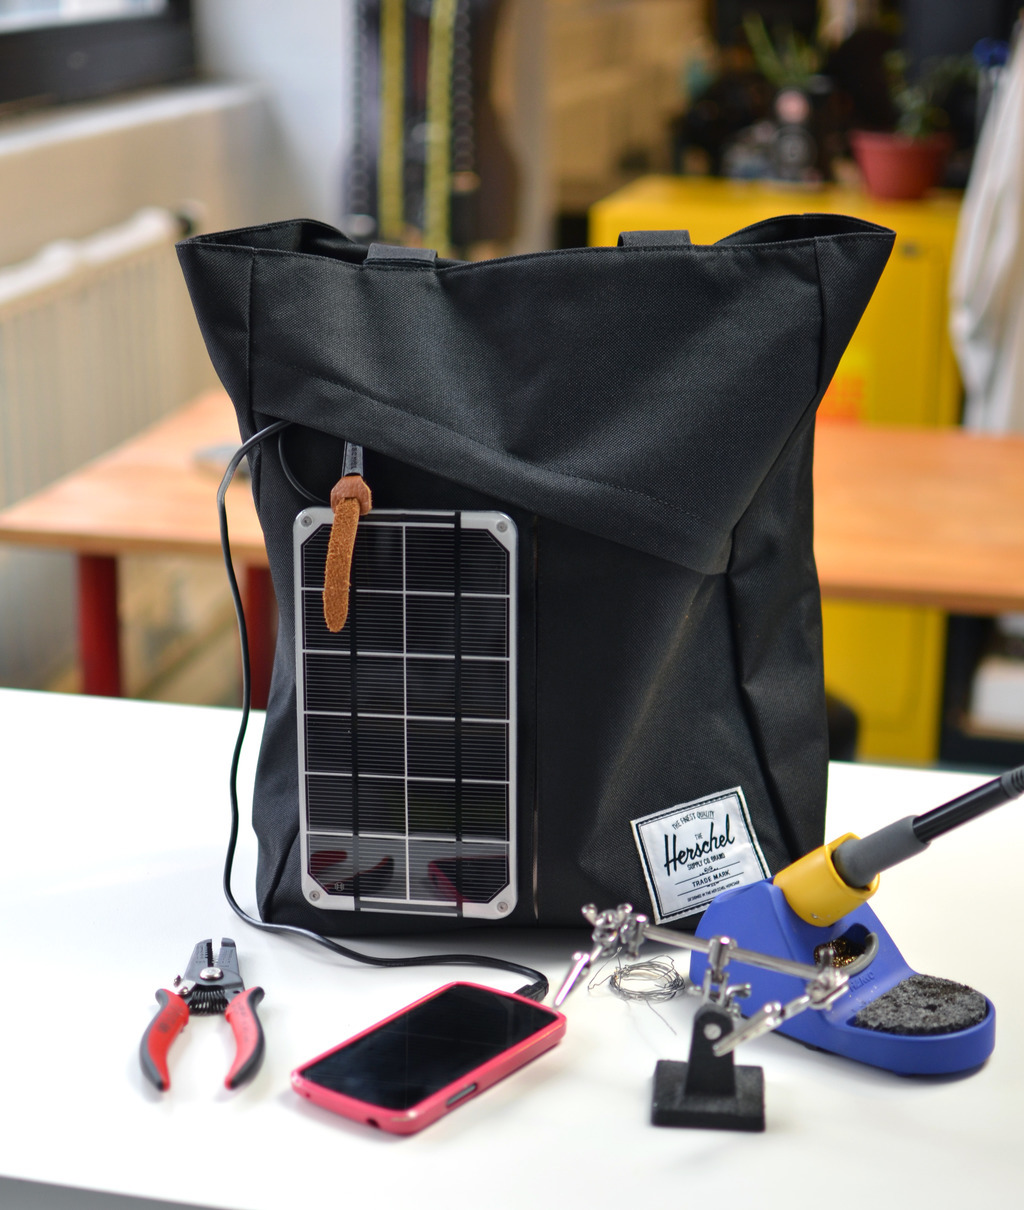 collin_s_lab_projects_solar-bag-minty-boost-adafruit.jpg